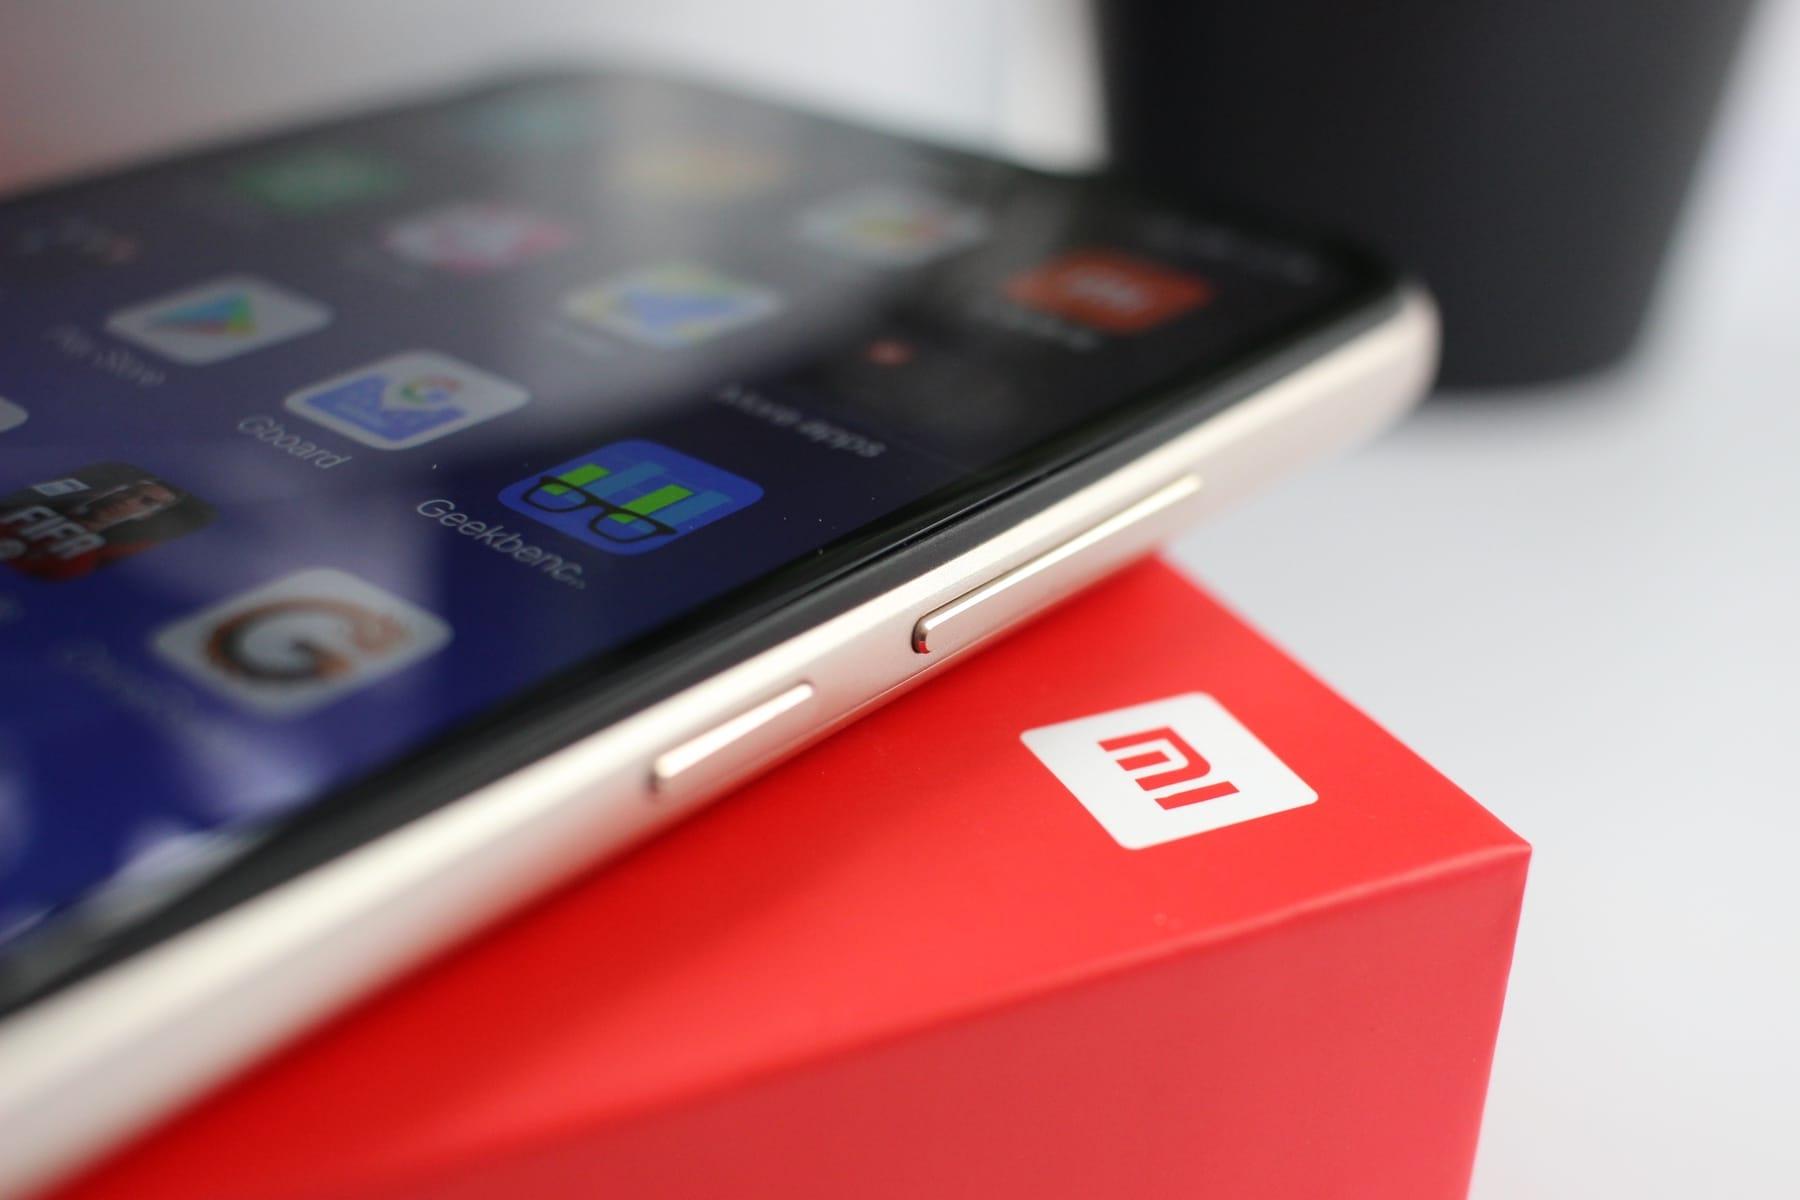 Xiaomi Redmi note 6 pro good camera